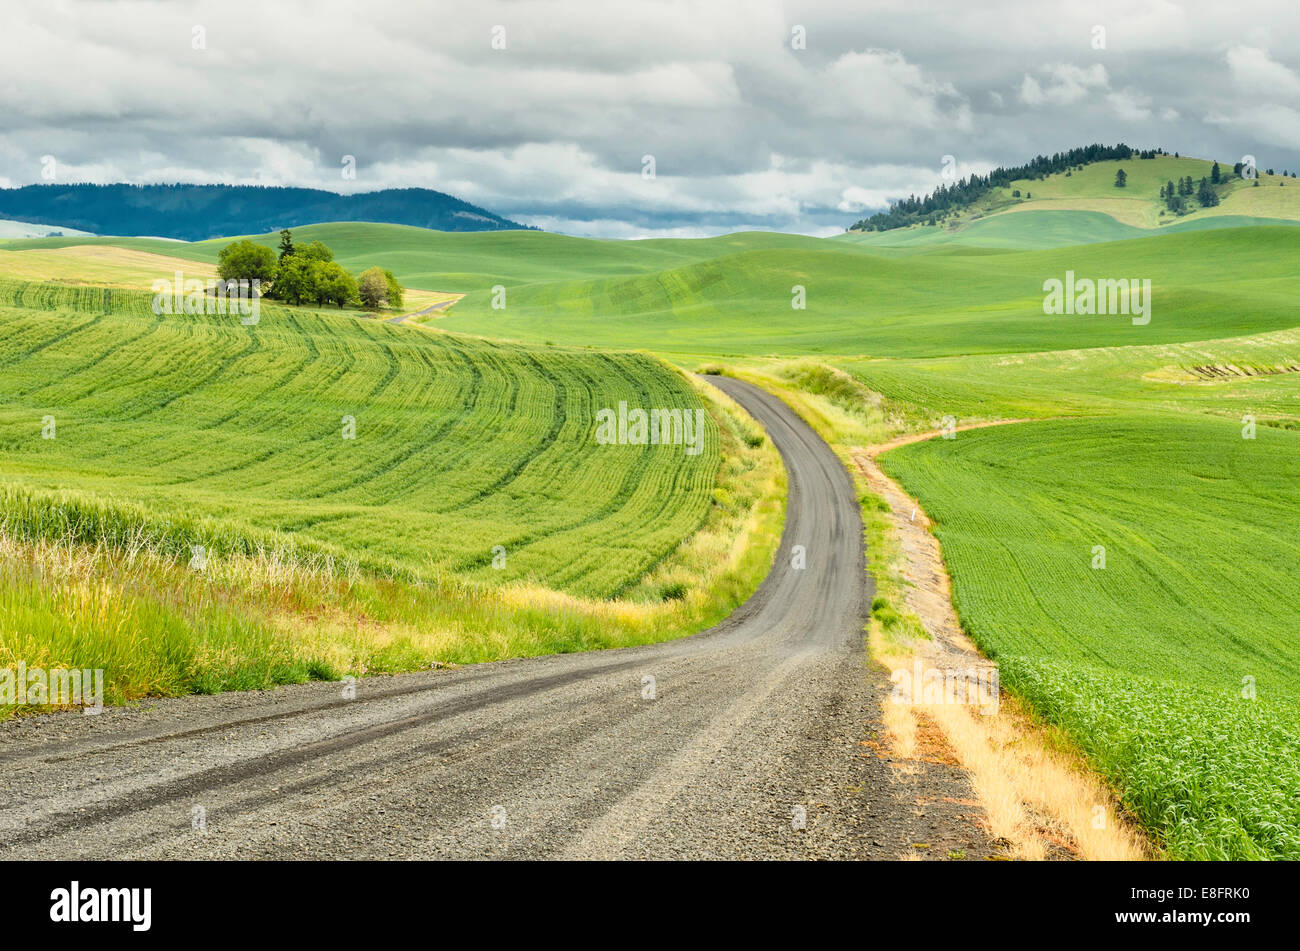 USA, Washington, Palouse, Winding country road - Stock Image